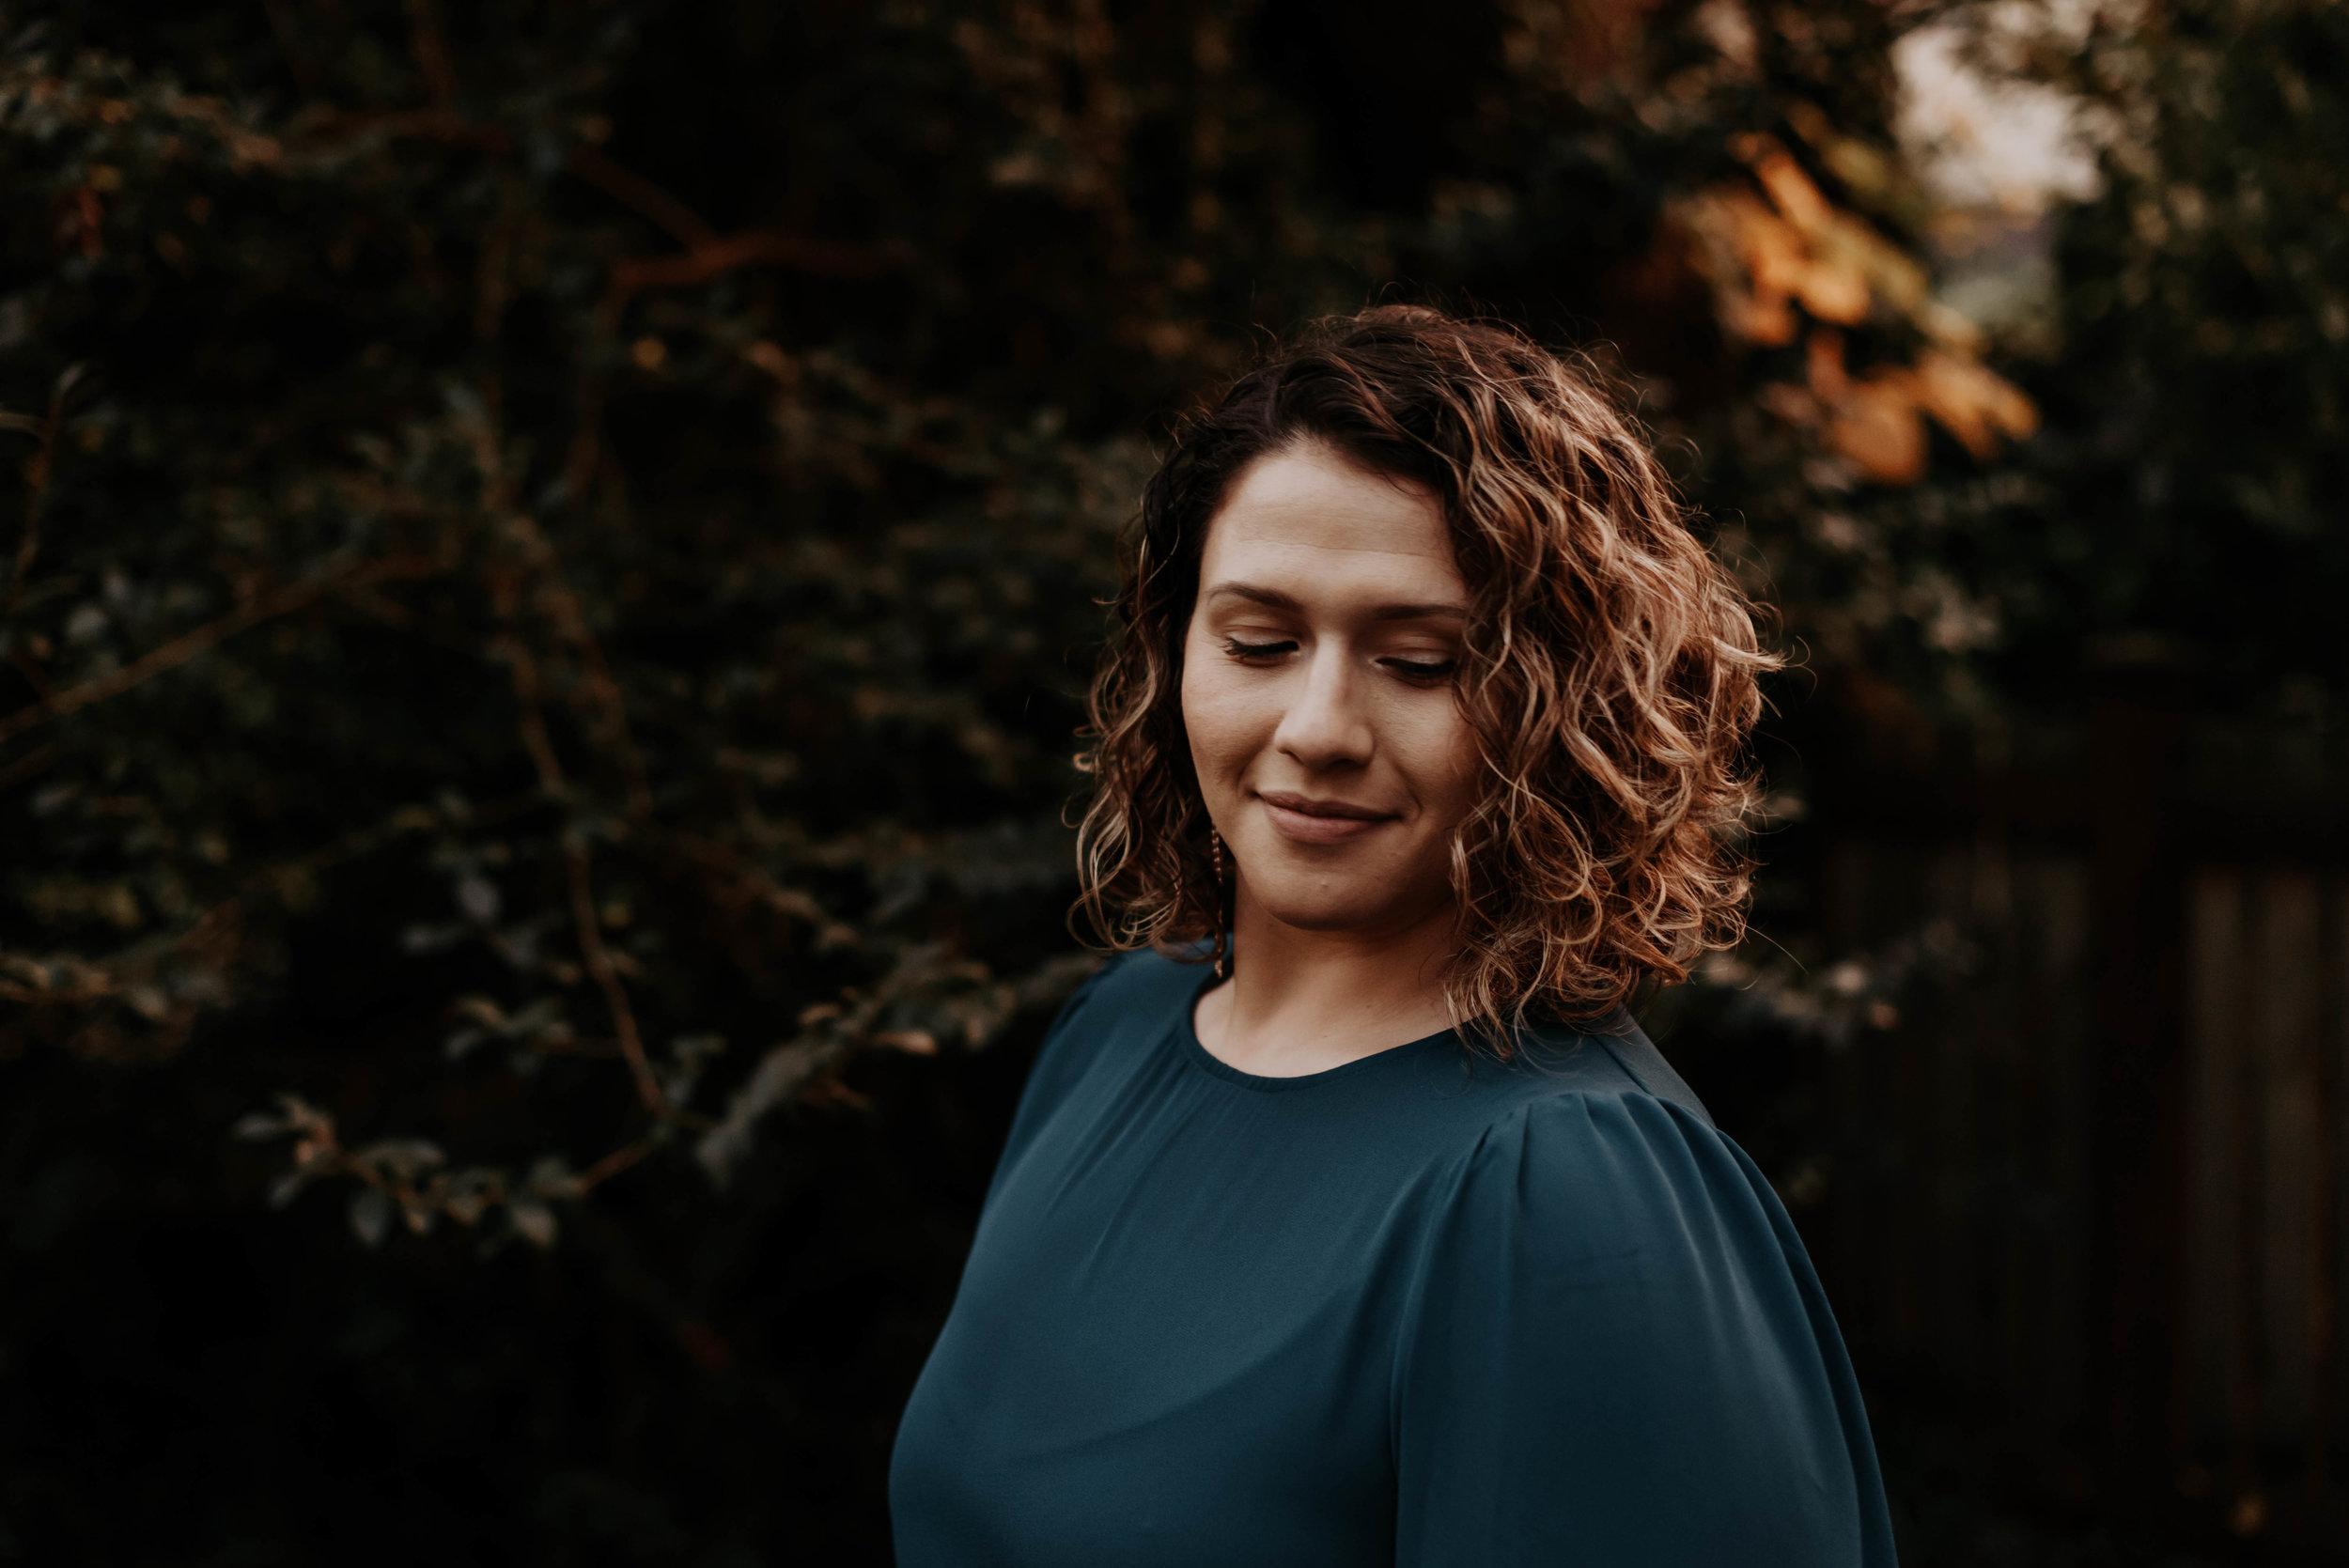 Erin-Kirkpatrick-Photography-Victoria-Graduation-Oct-2017-79.jpg